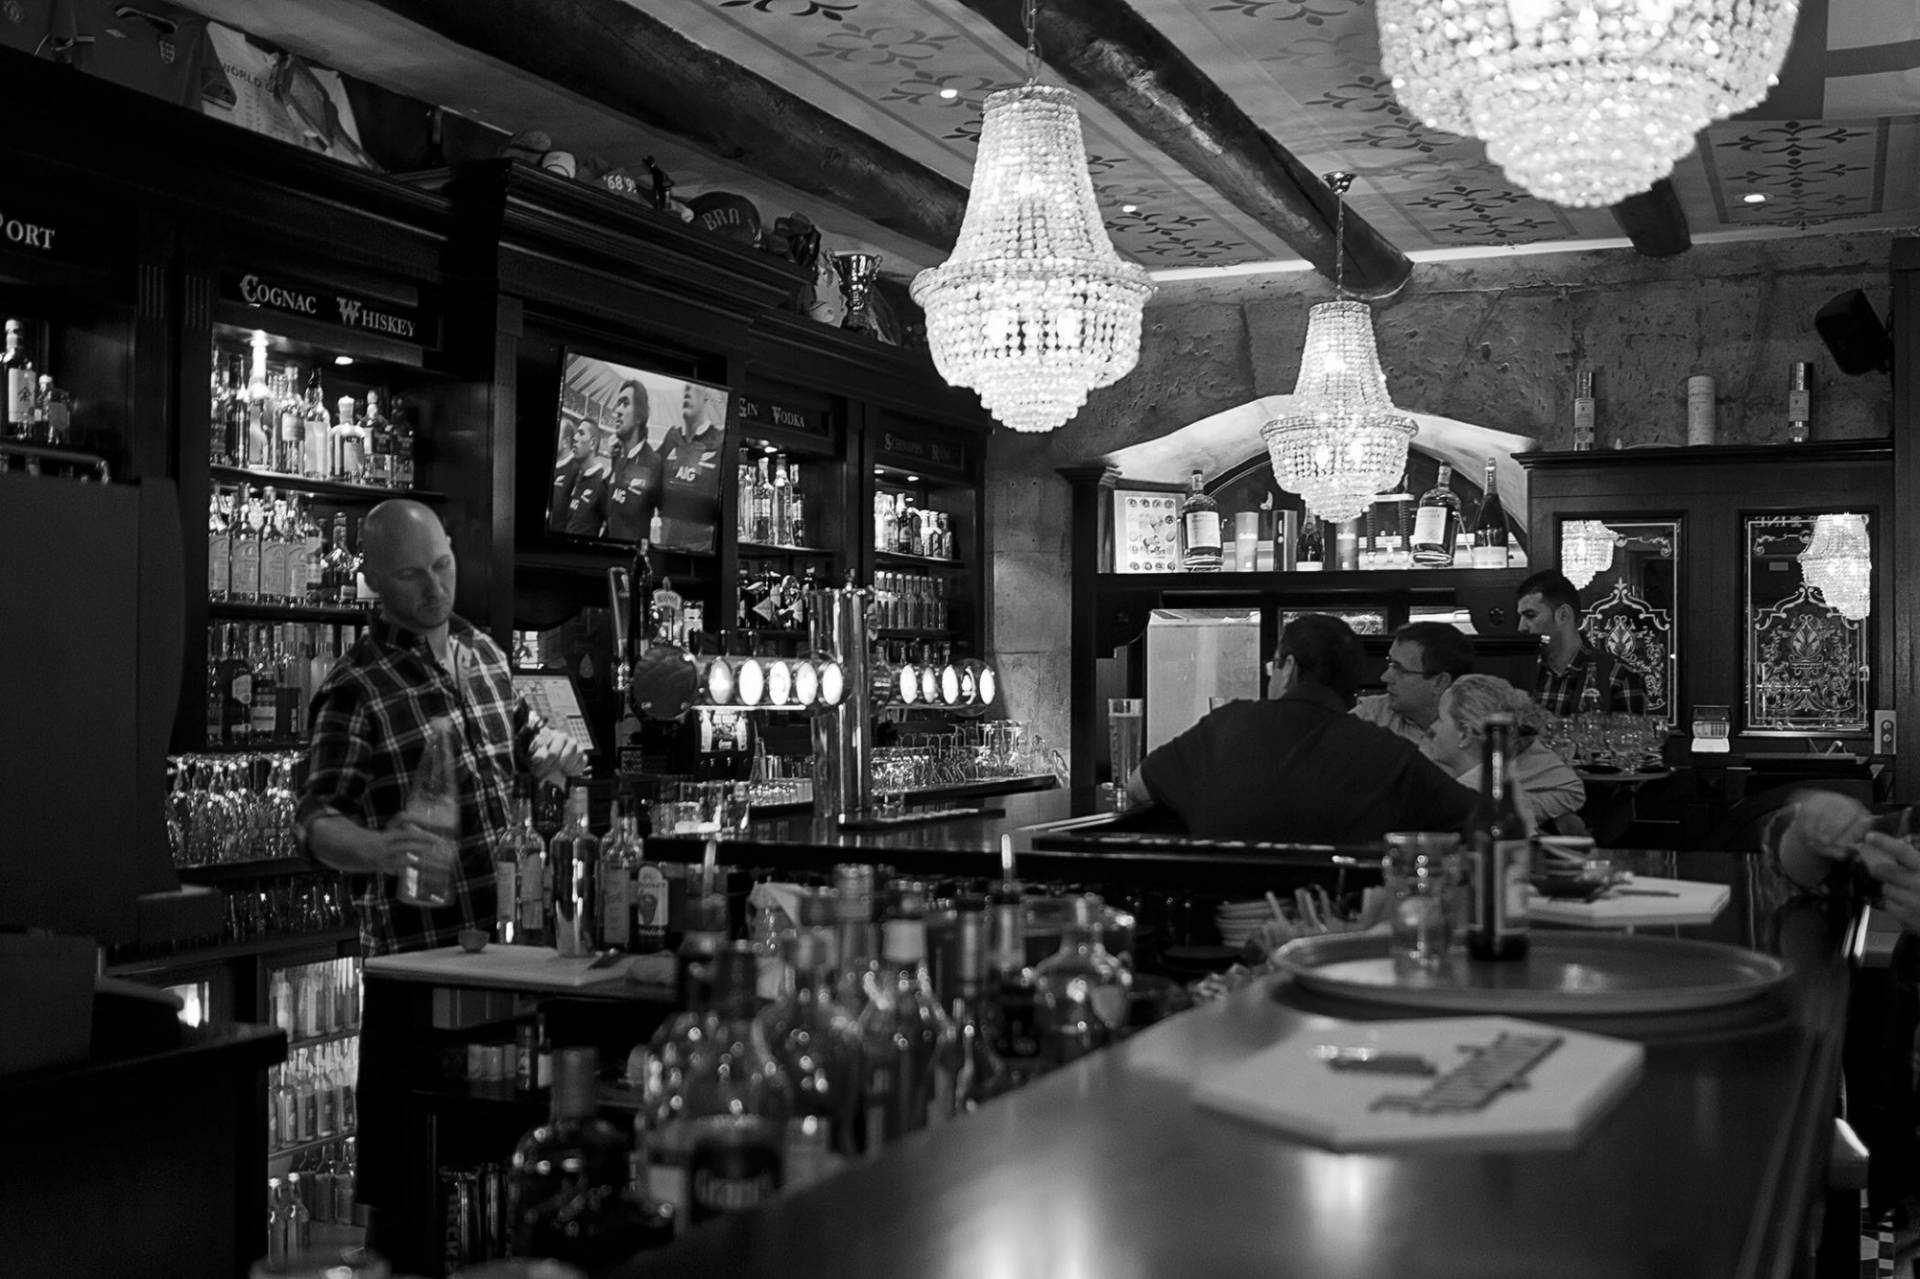 Pub anglais au vieux port de marseille the queen - Au vieux port restaurant marseille ...